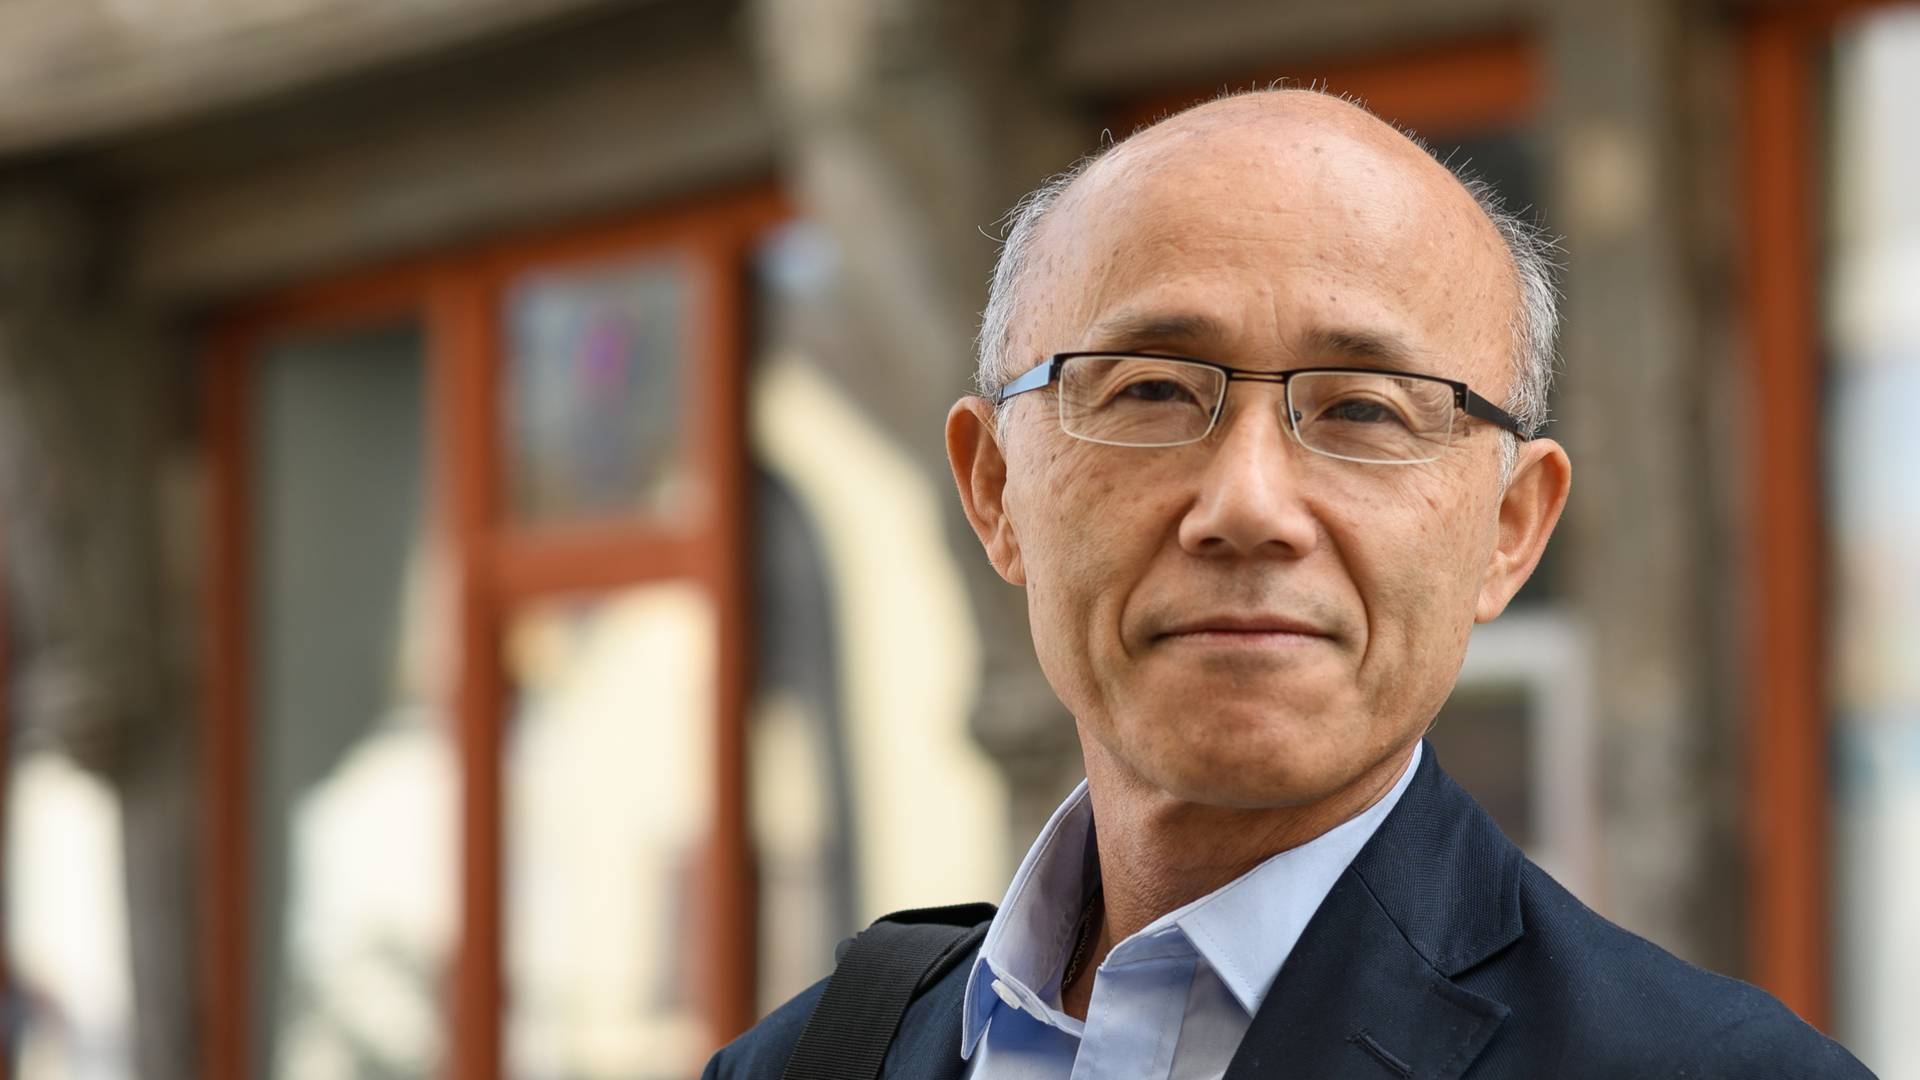 Yuken Takigaura